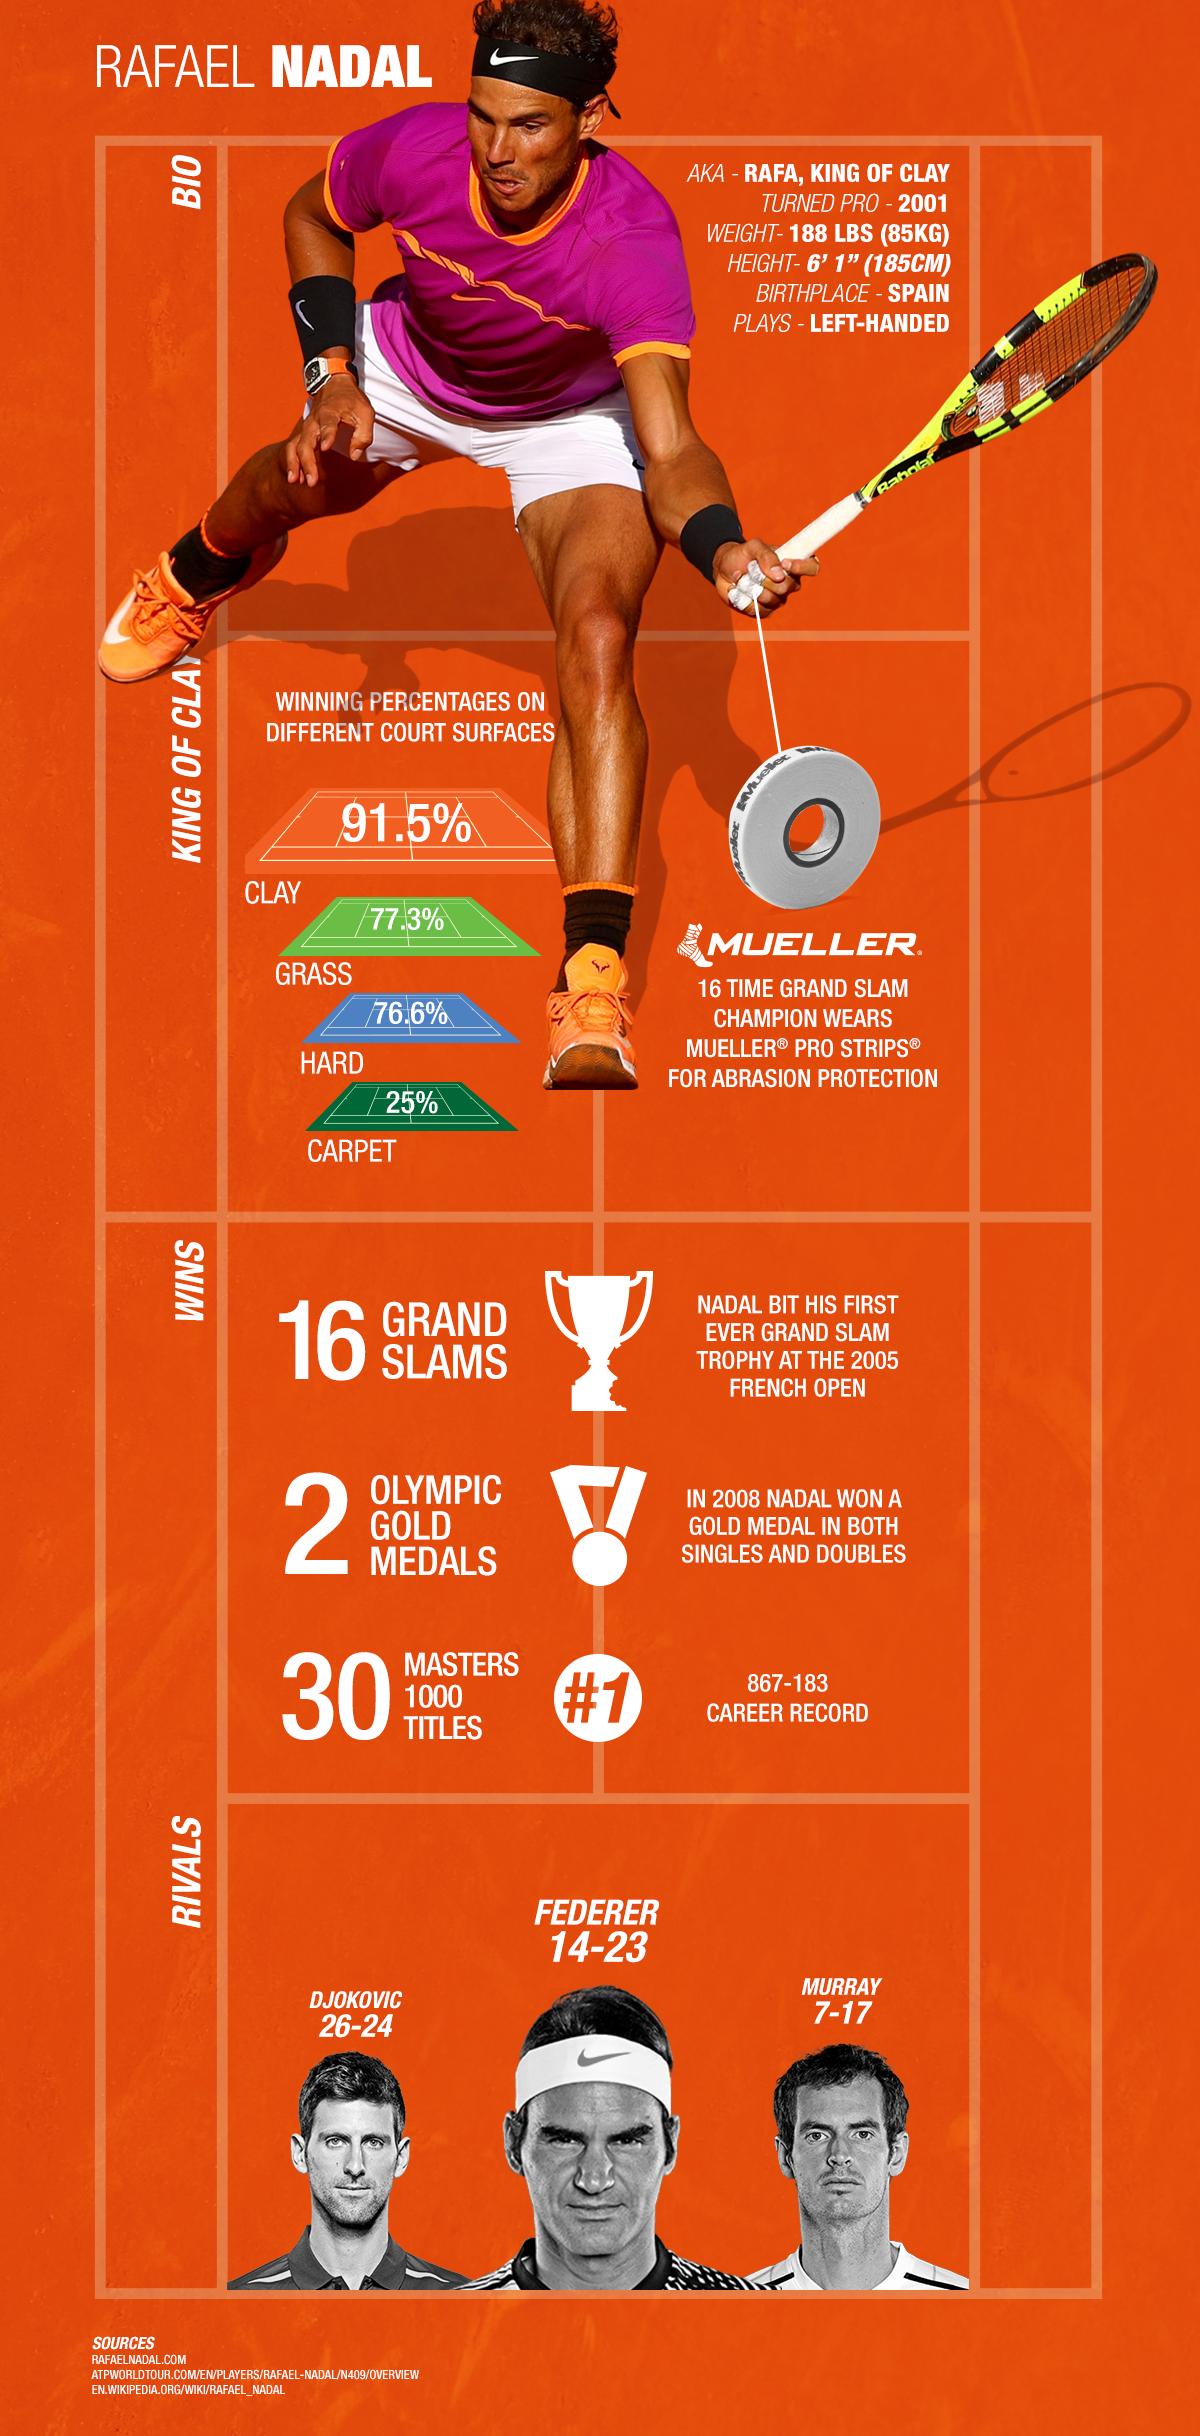 Rafael Nadal 16 Time Grand Slam Champion wears Mueller ProStrips